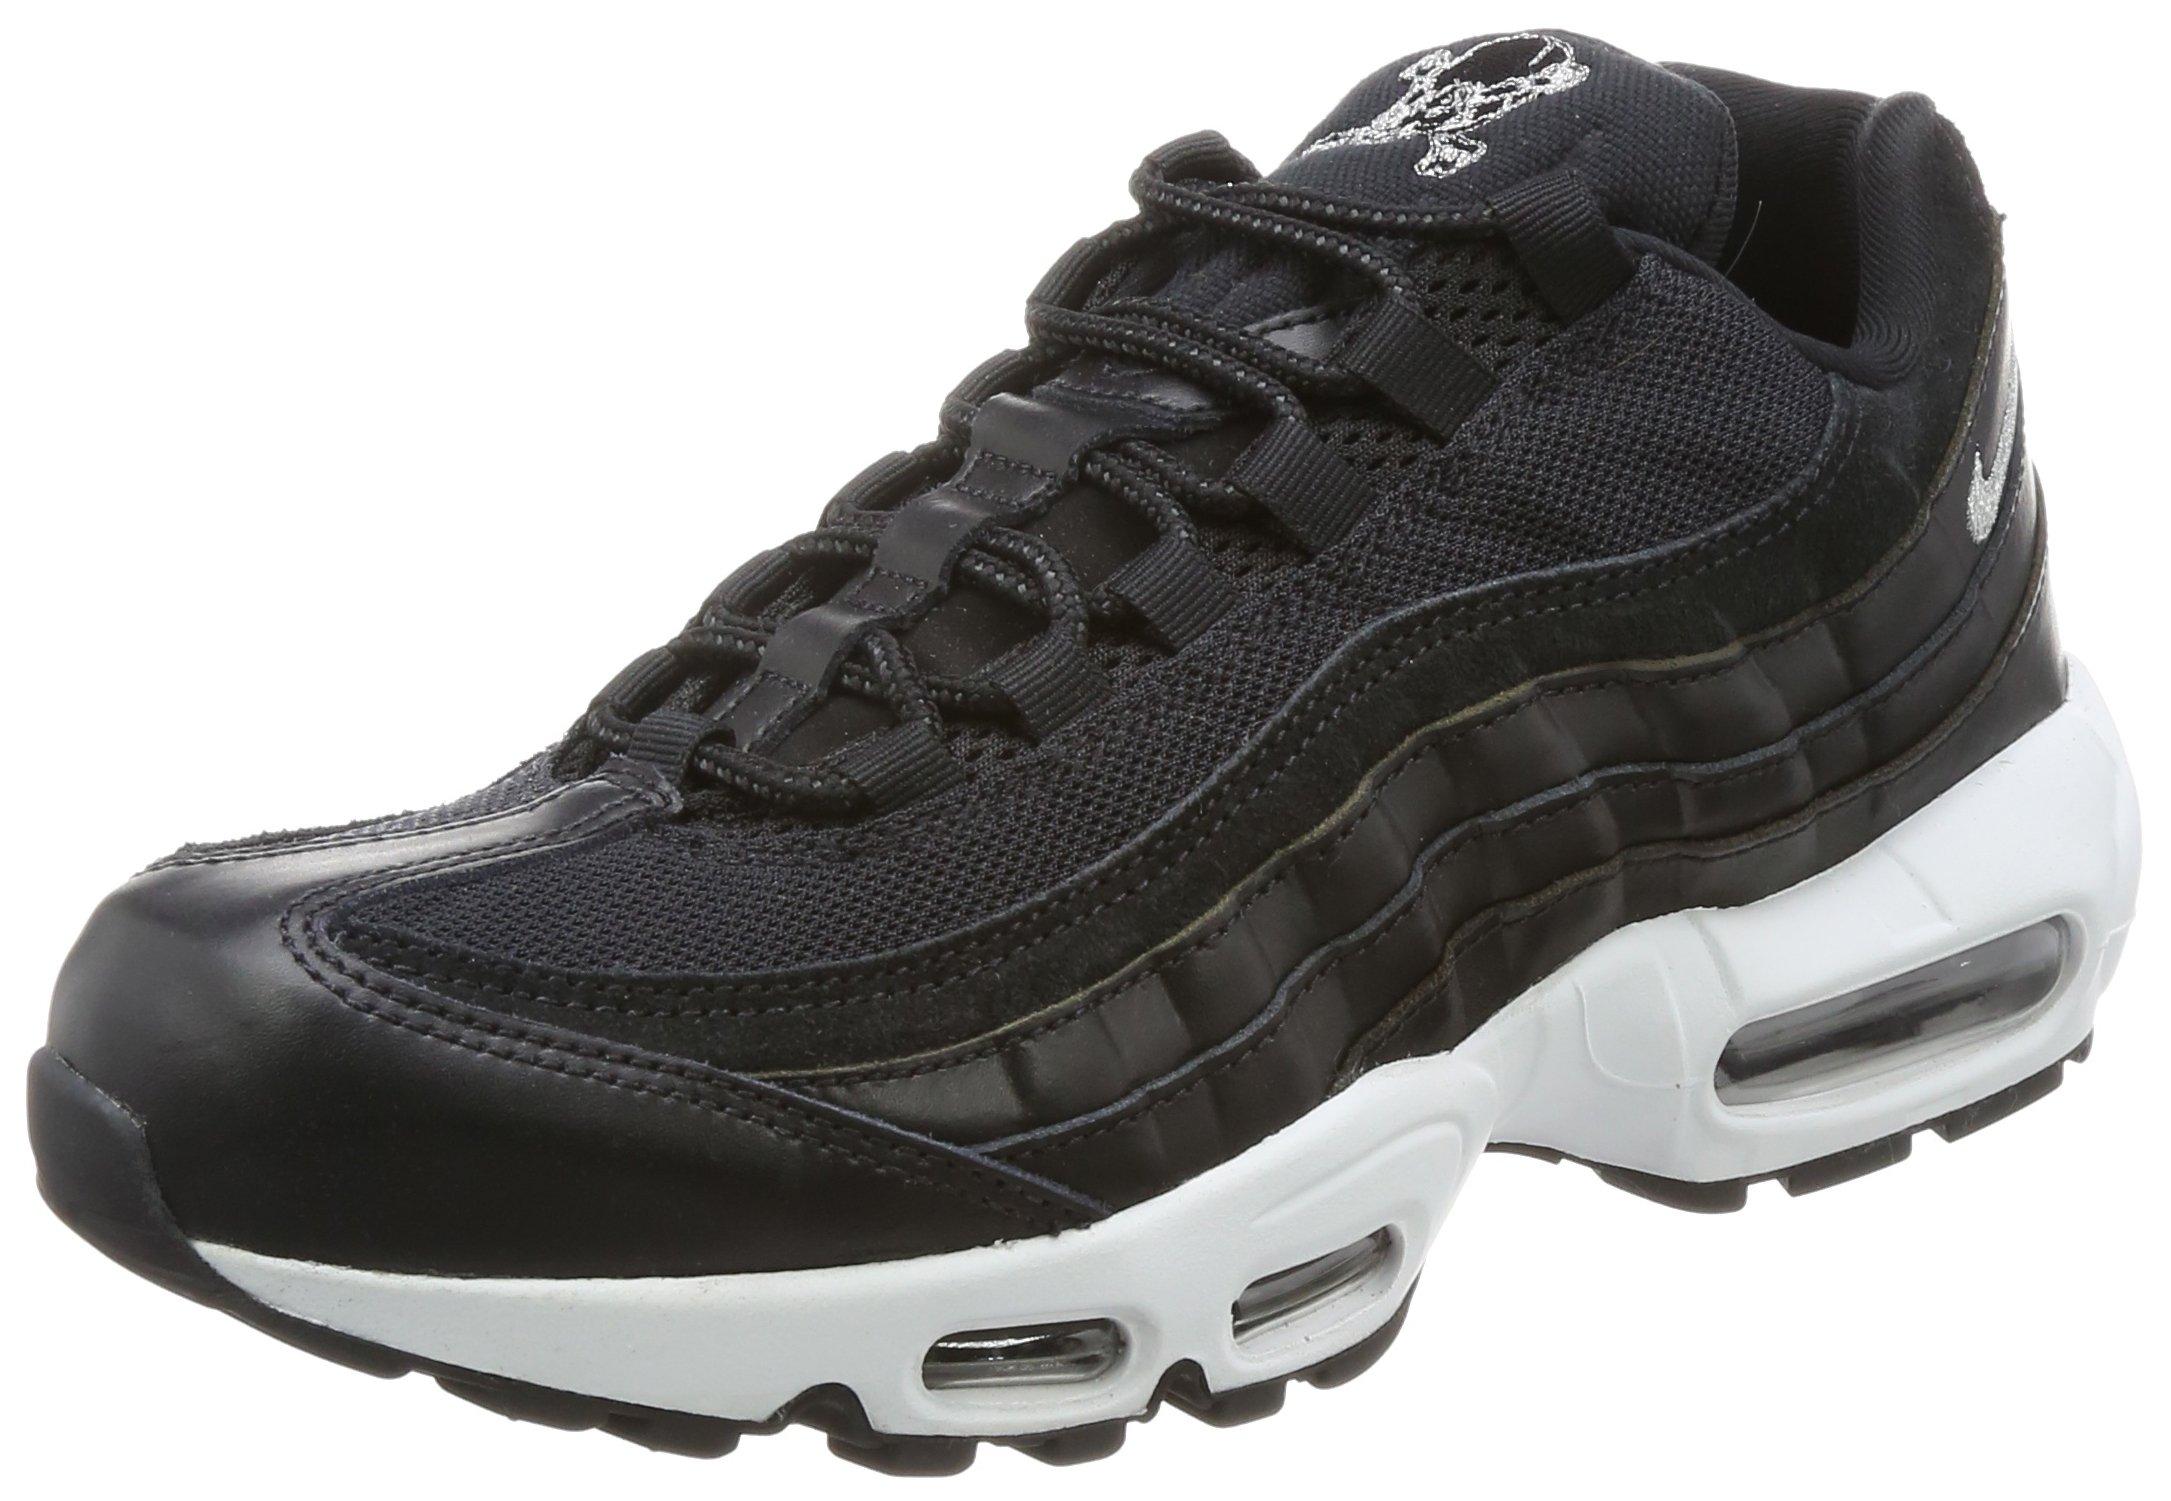 buy popular 86fc1 c48ed Galleon - NIKE AIR MAX 95 PRM Mens Fashion-Sneakers Bstn 538416-008 8.5 -  Black Chrome-Black-Off White